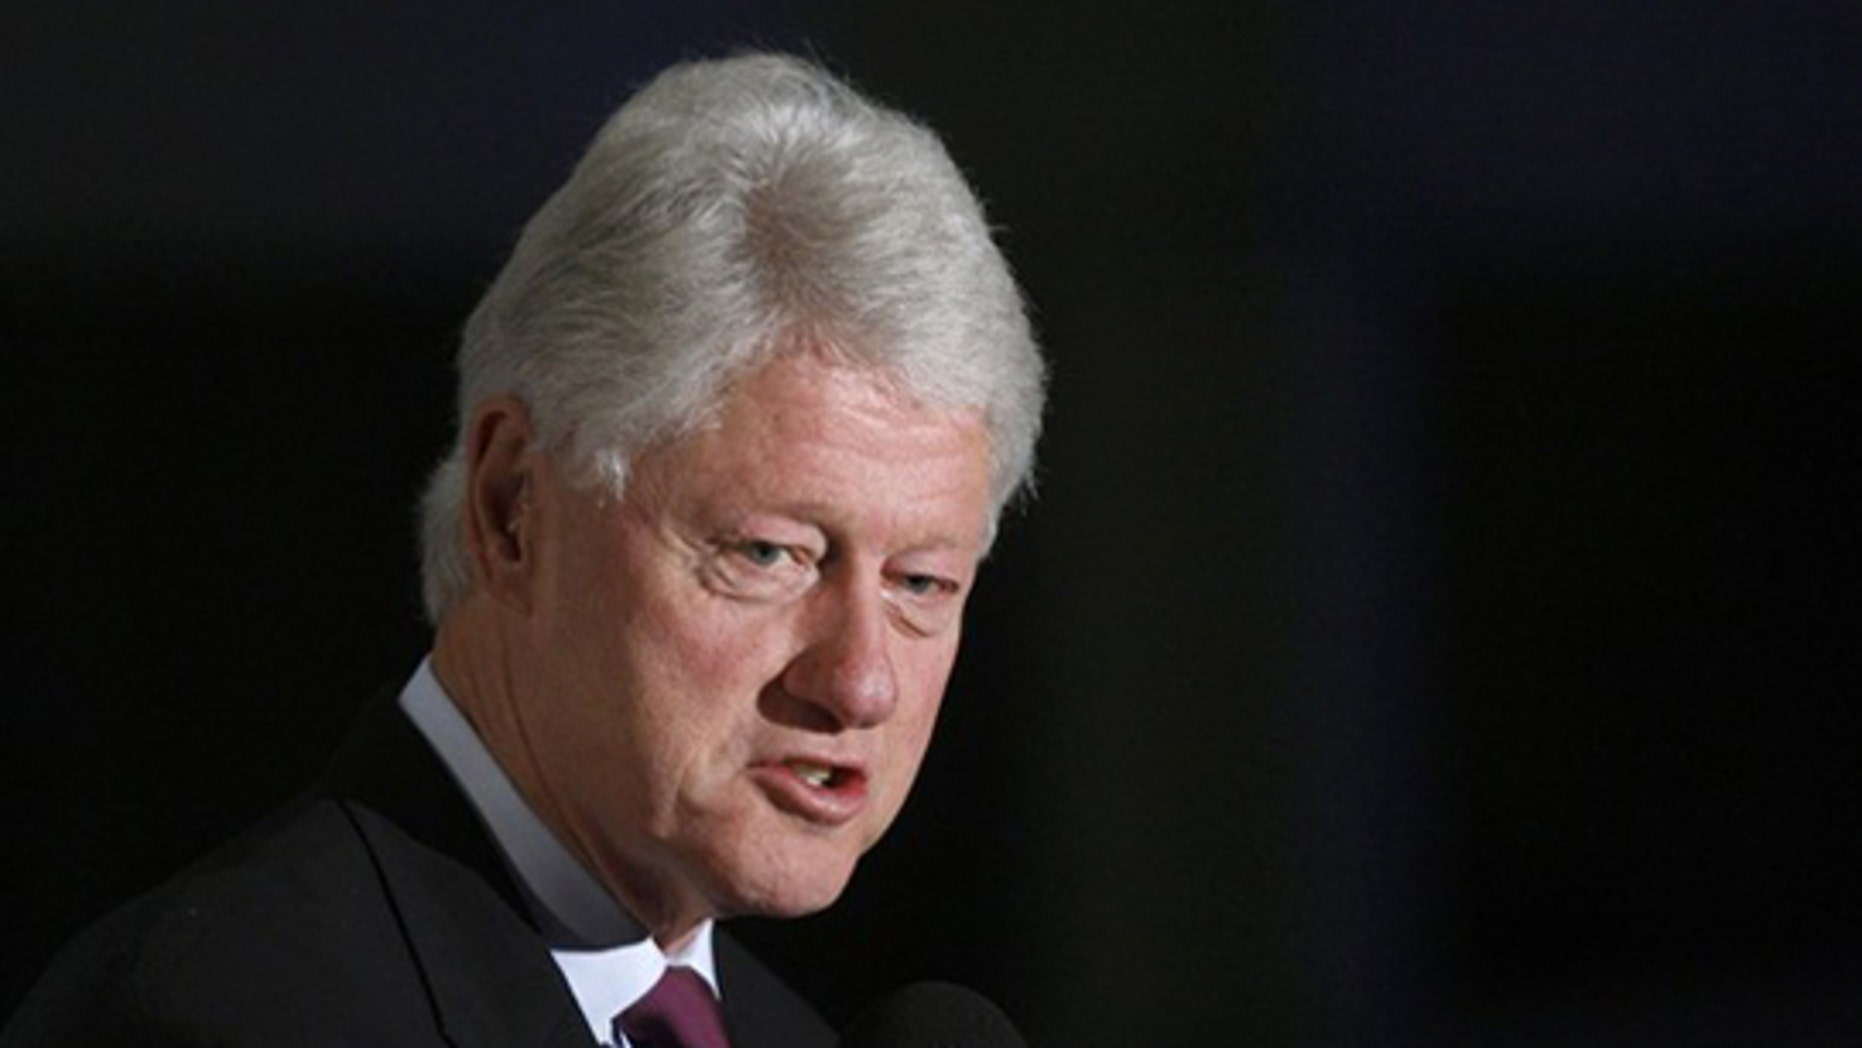 Nov. 14: Former President Bill Clinton speaks during his visit to the Rabin Center in Tel Aviv.